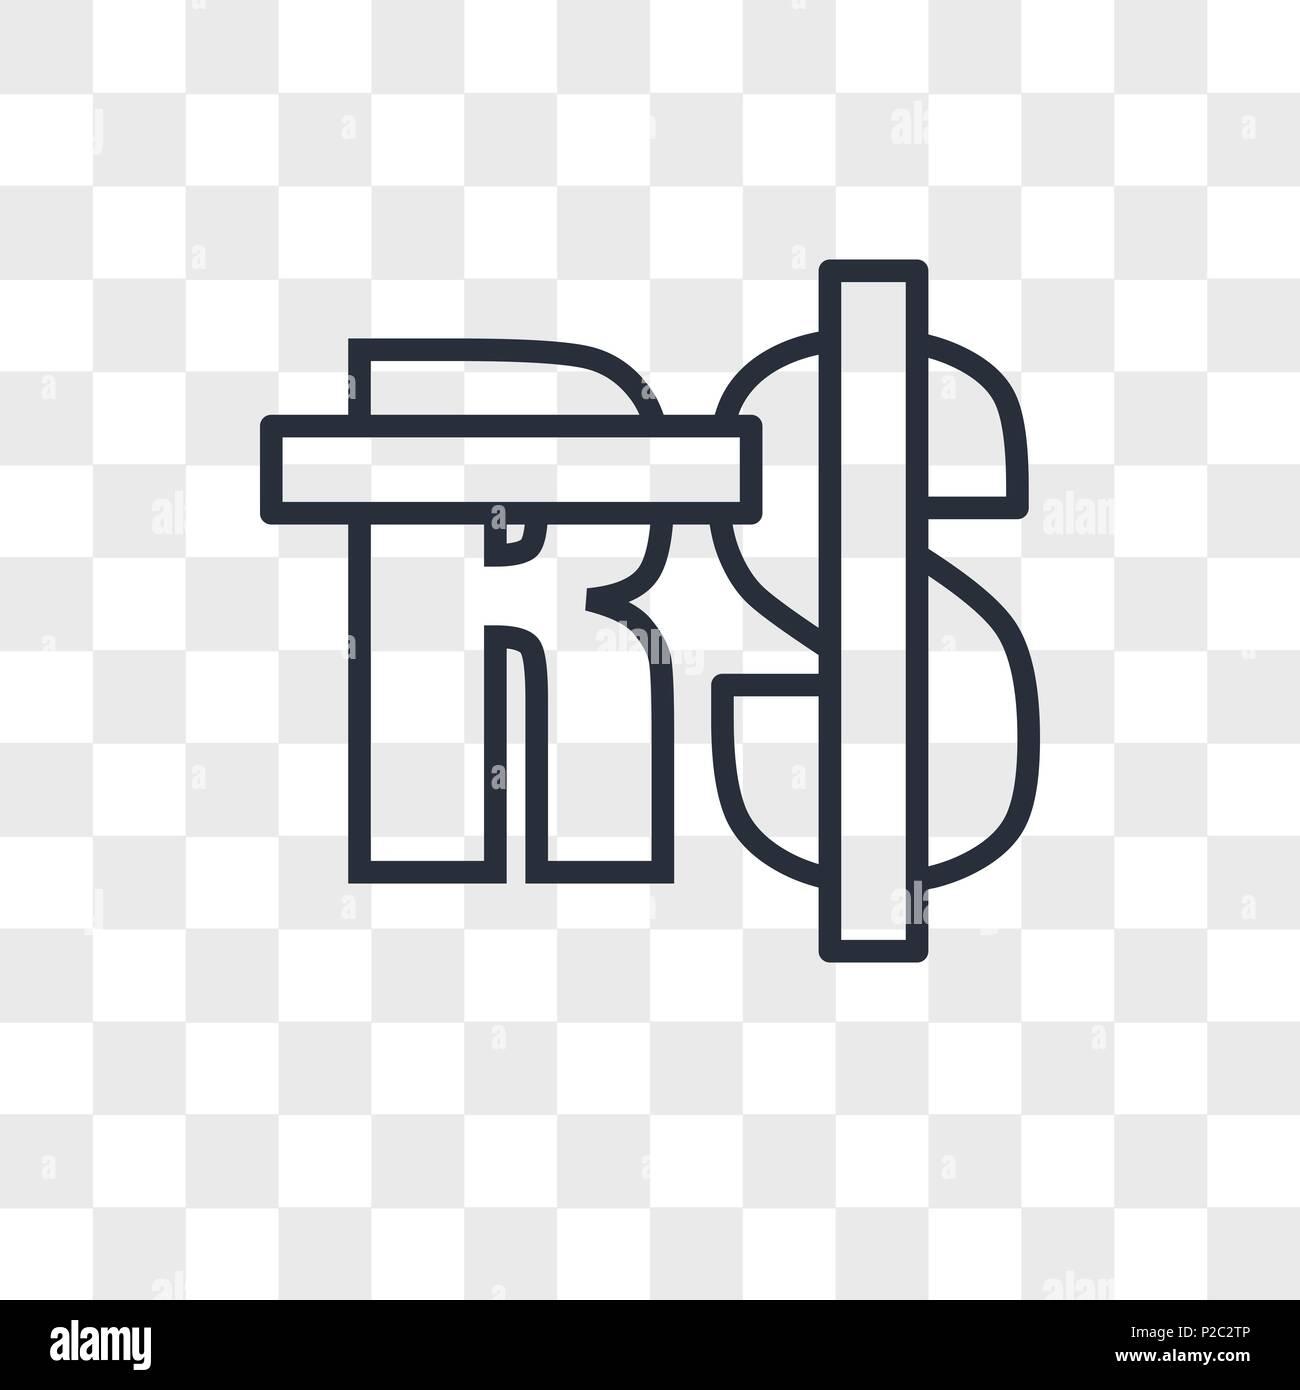 Saudi Riyal Vector Icon Isolated On Transparent Background Saudi